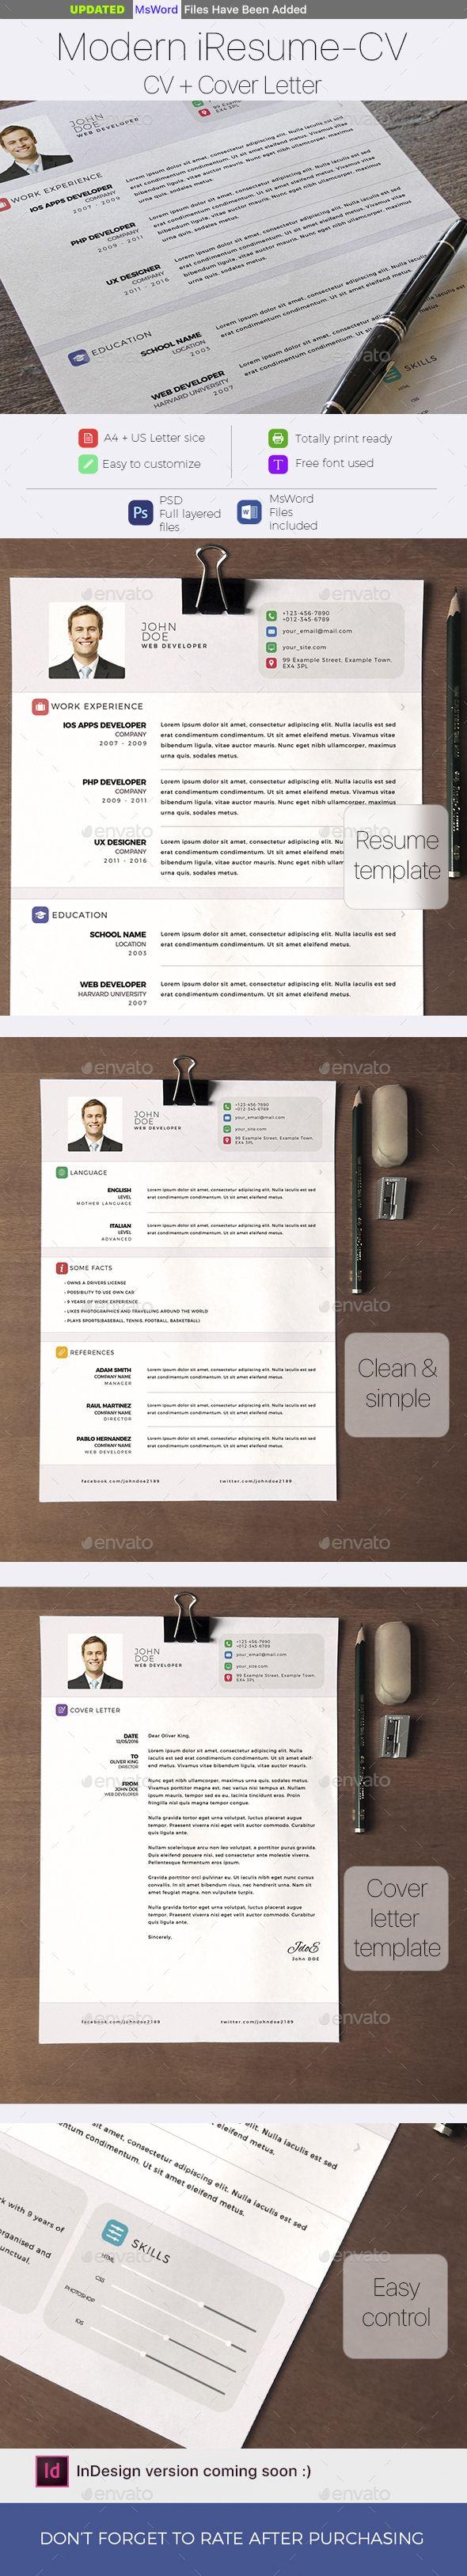 Modern i Resume Resumes Stationery Download